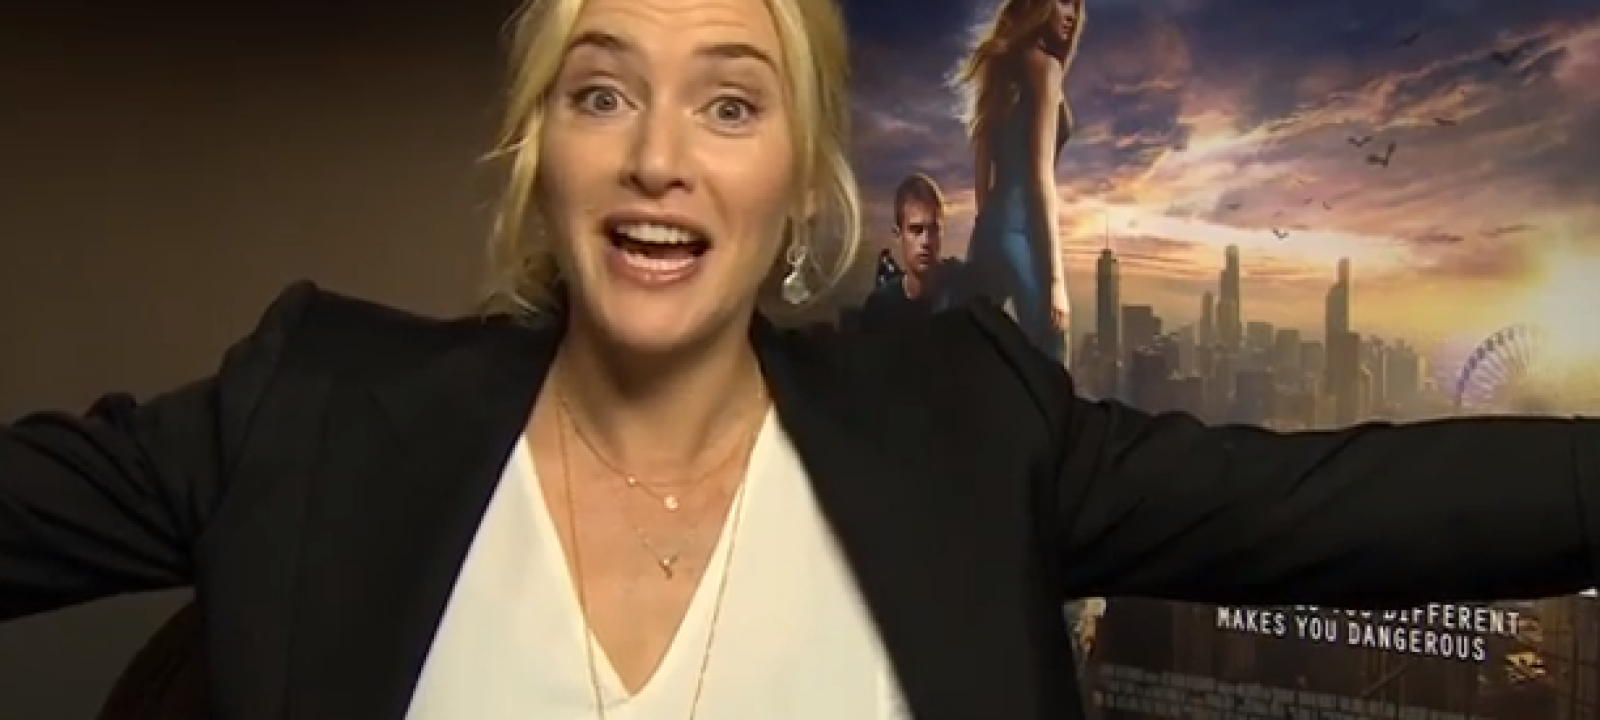 Wedding Video, Kate Winslet